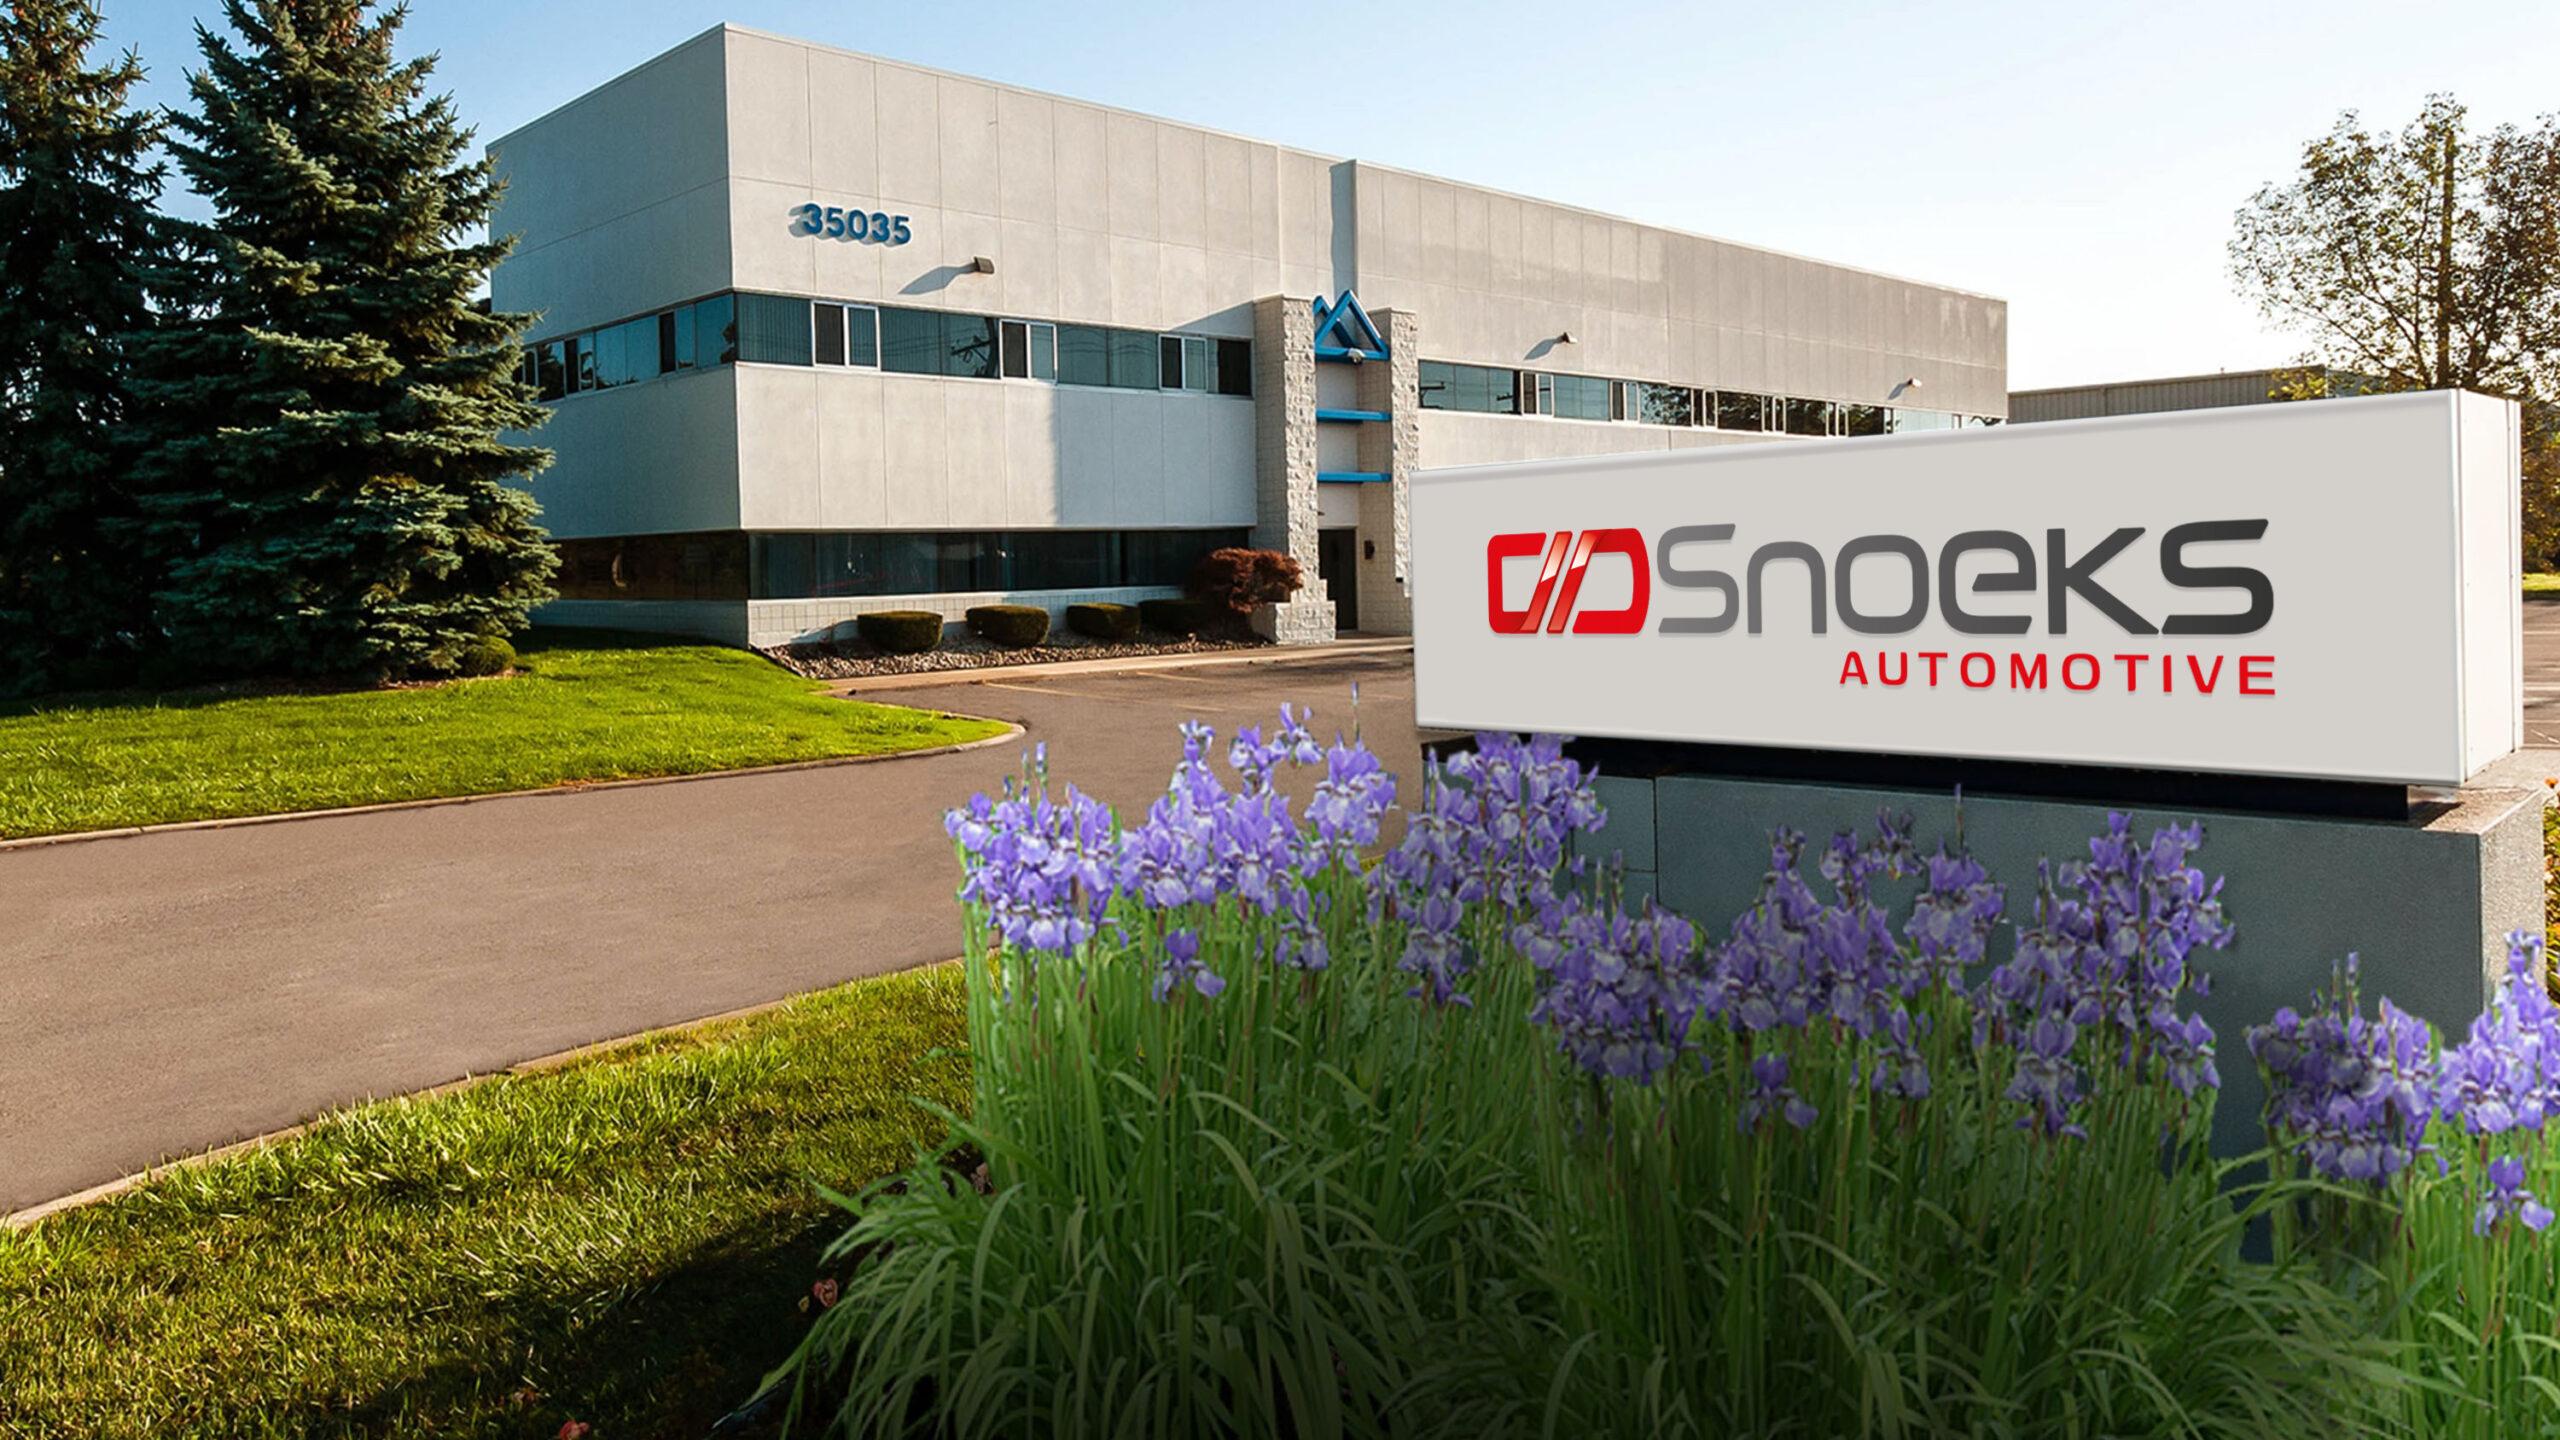 Snoeks Automotive North America Contact us